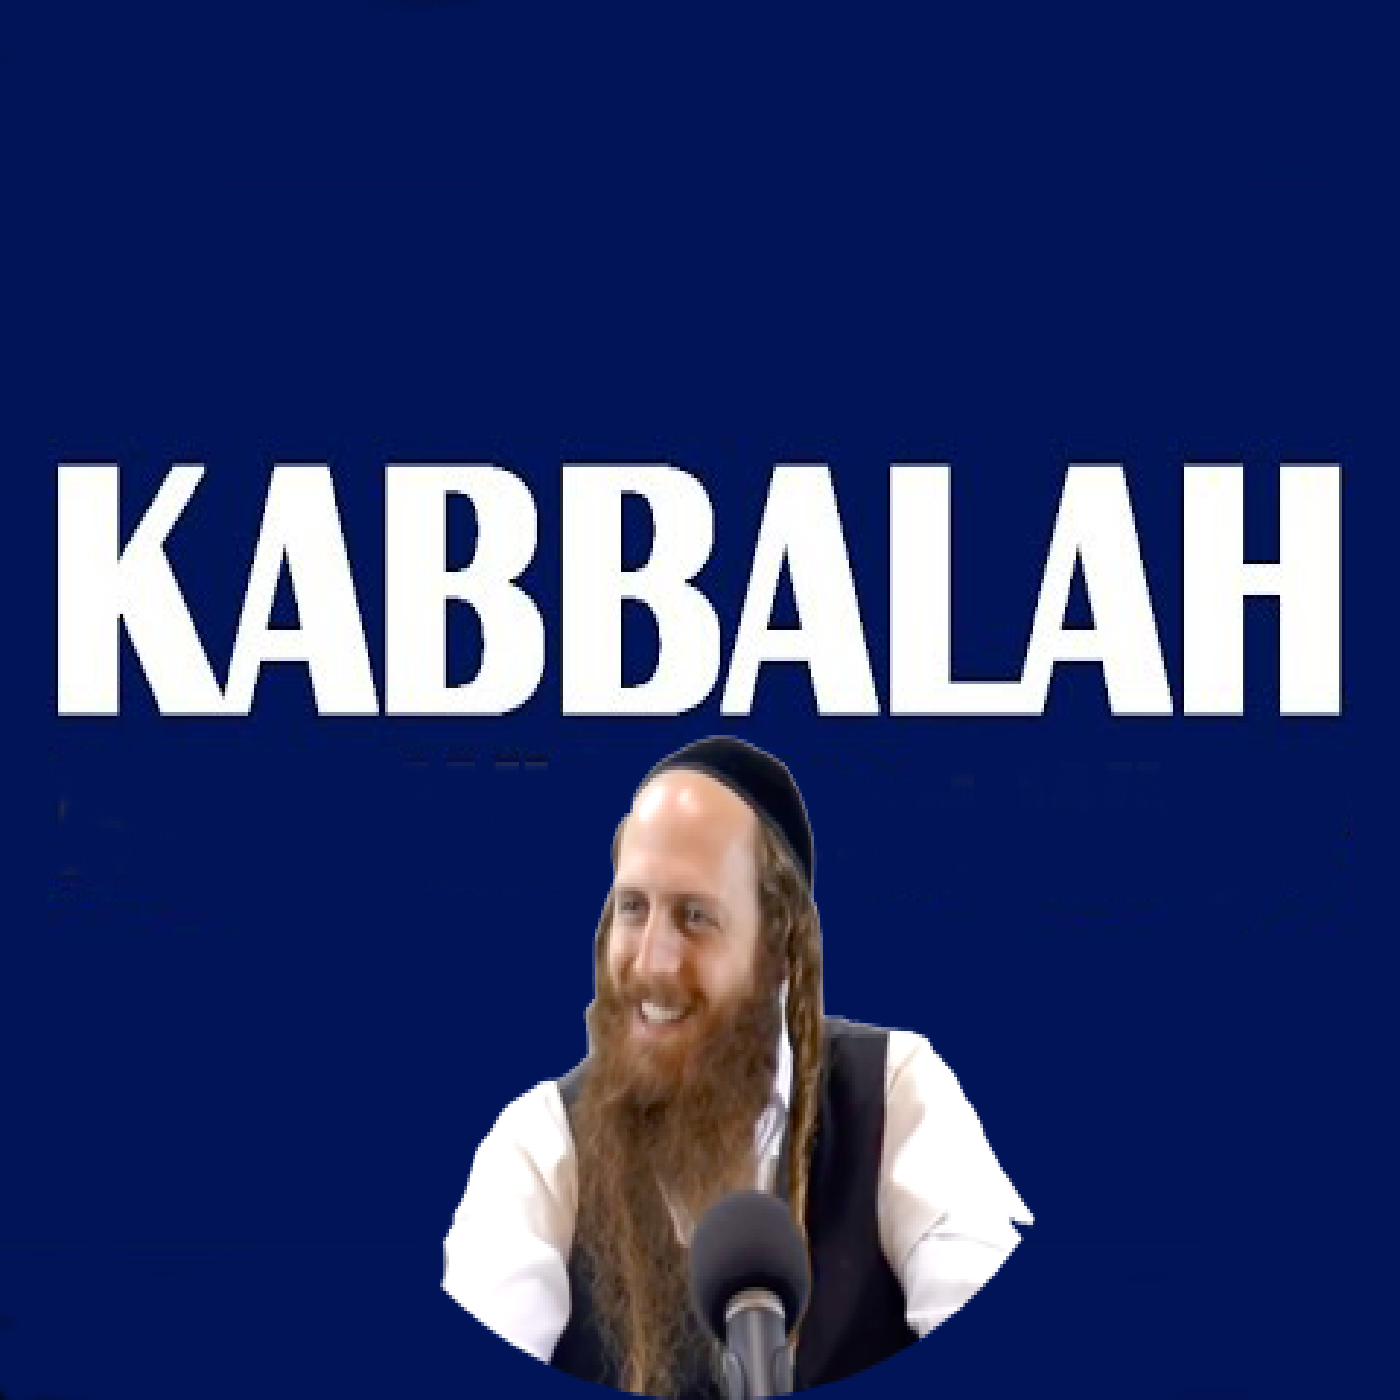 Artwork for Making the Torah Simple Taking Kabbalah and Making it Practical with Rav Dror